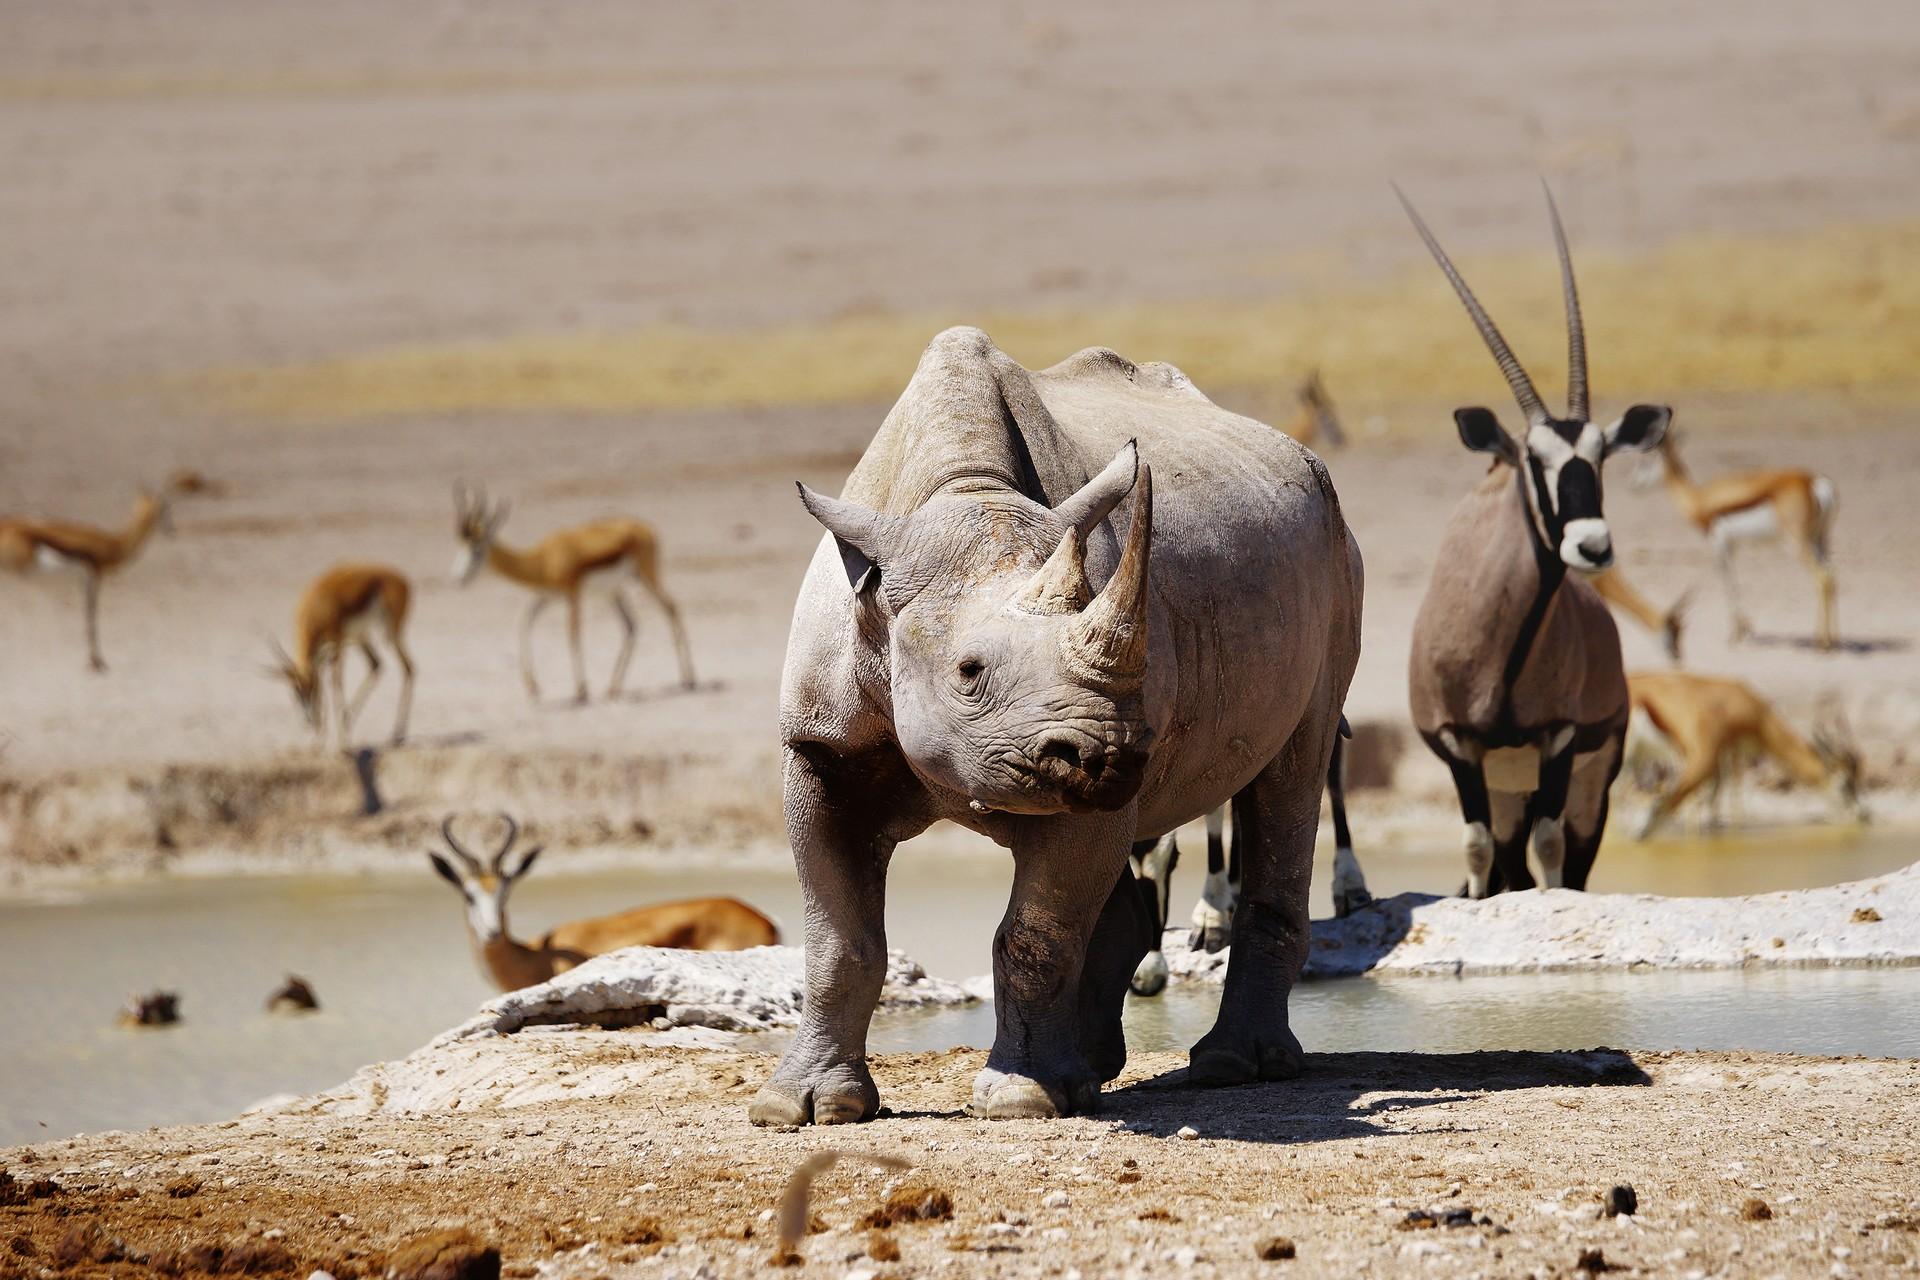 Black rhino in Namibia